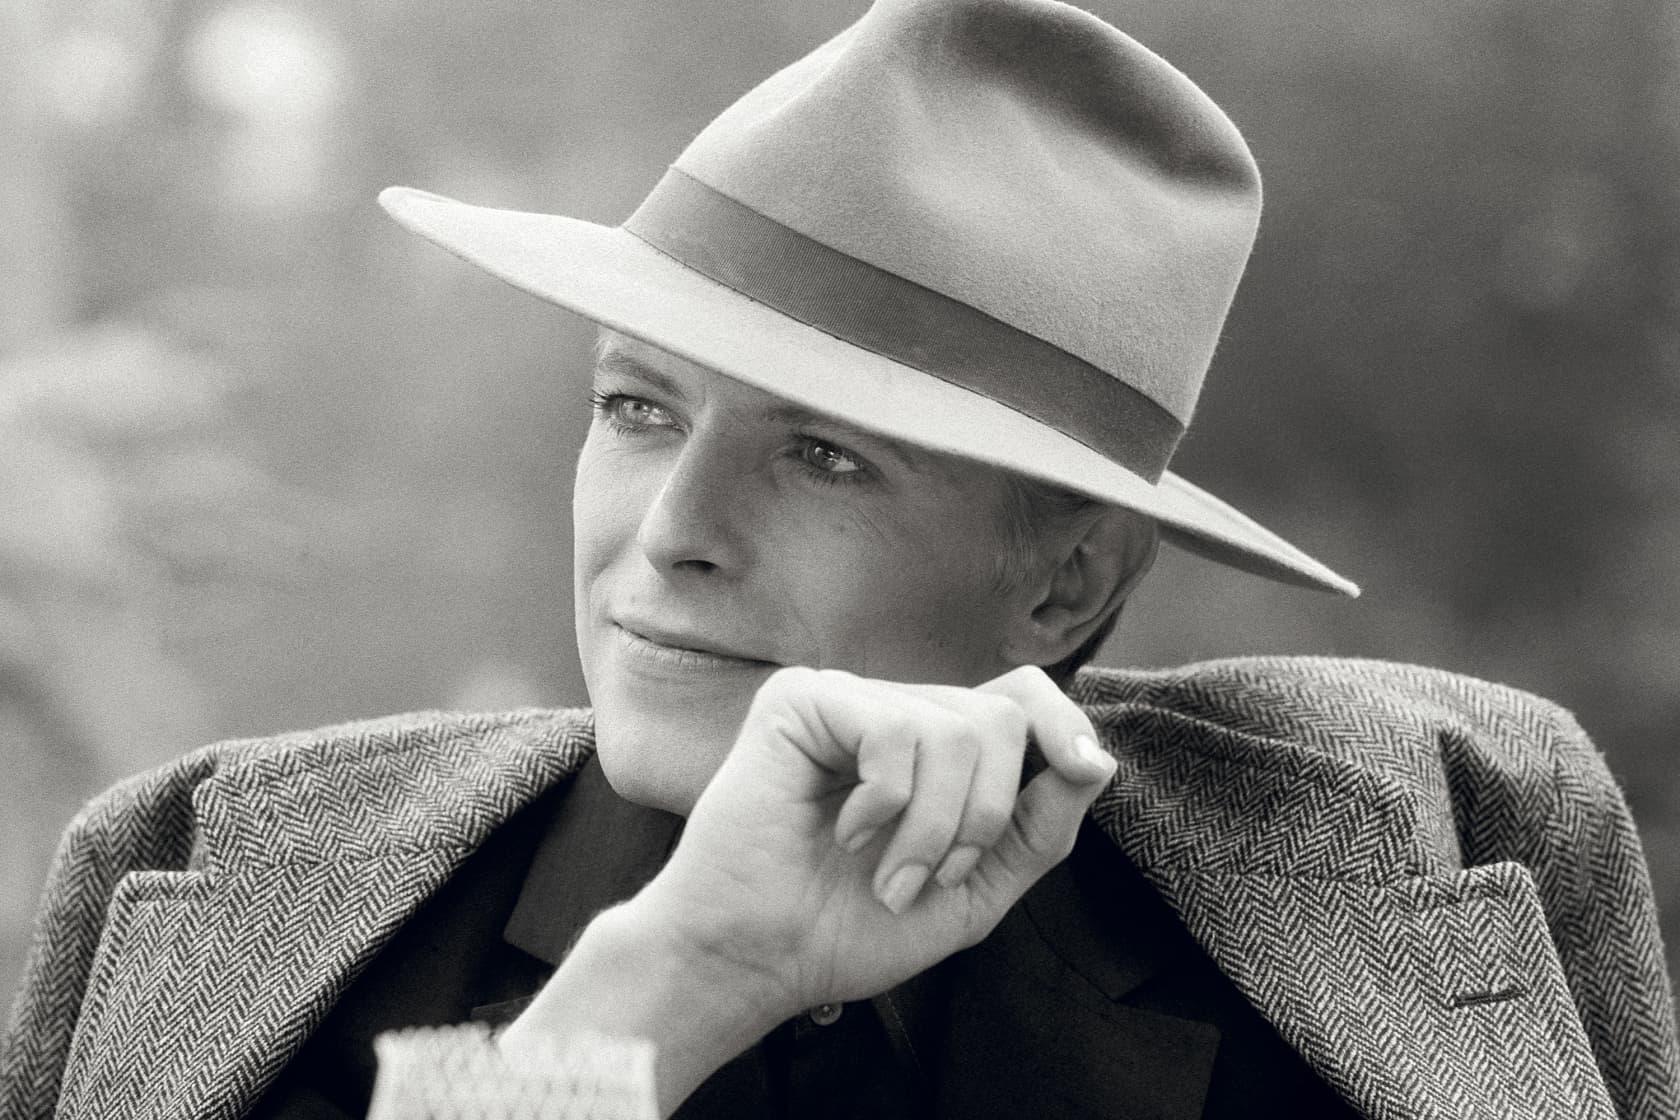 Terry O'Neill, David Bowie, 1975